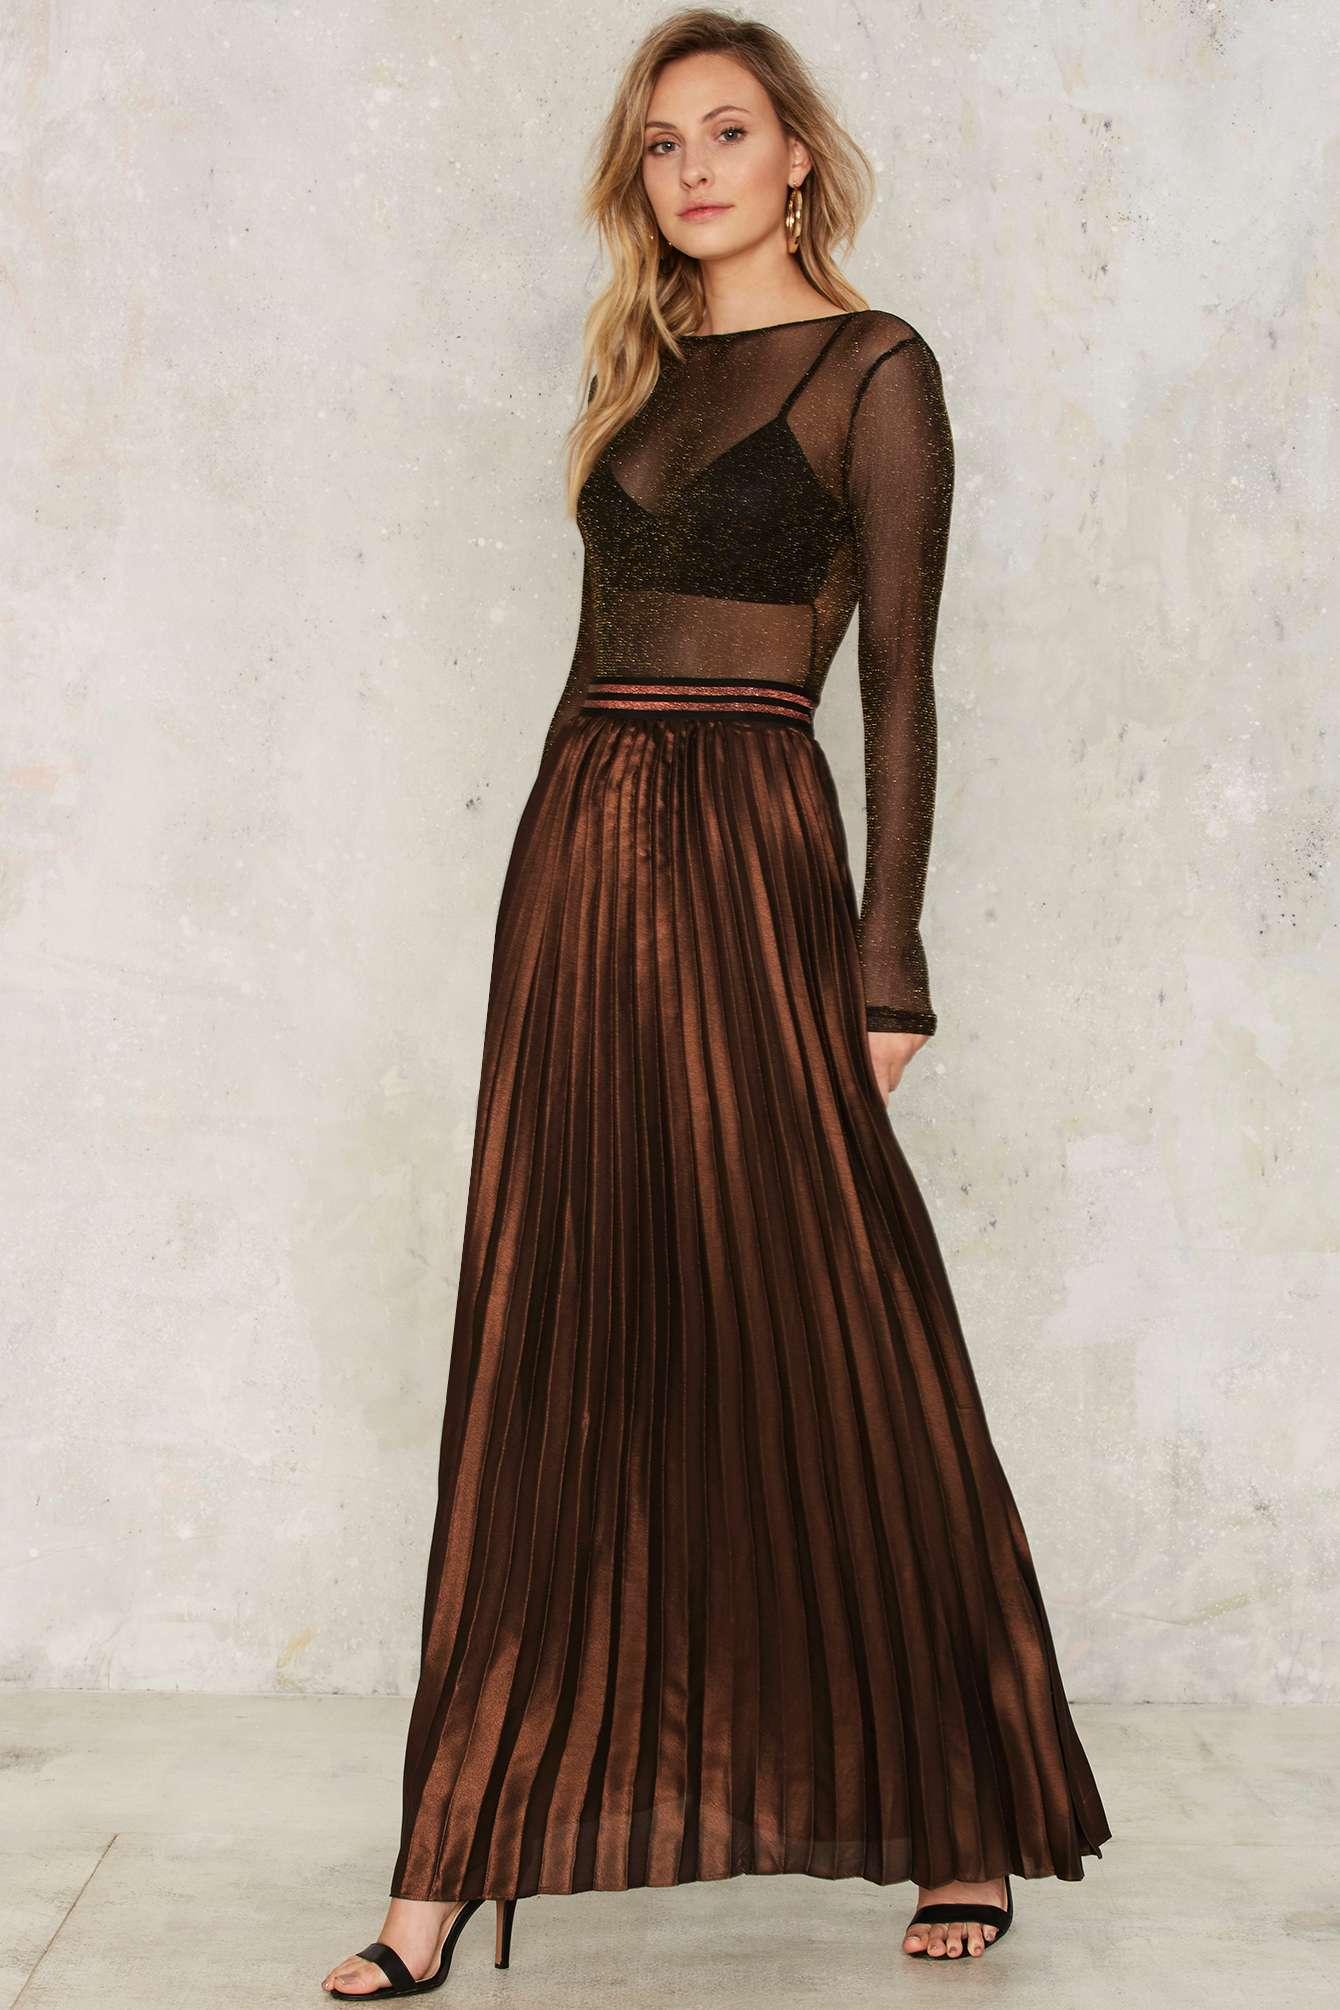 rivenditore di vendita 9433a b104d Le gonne lunghe più glamour per le tue feste - Melarossa